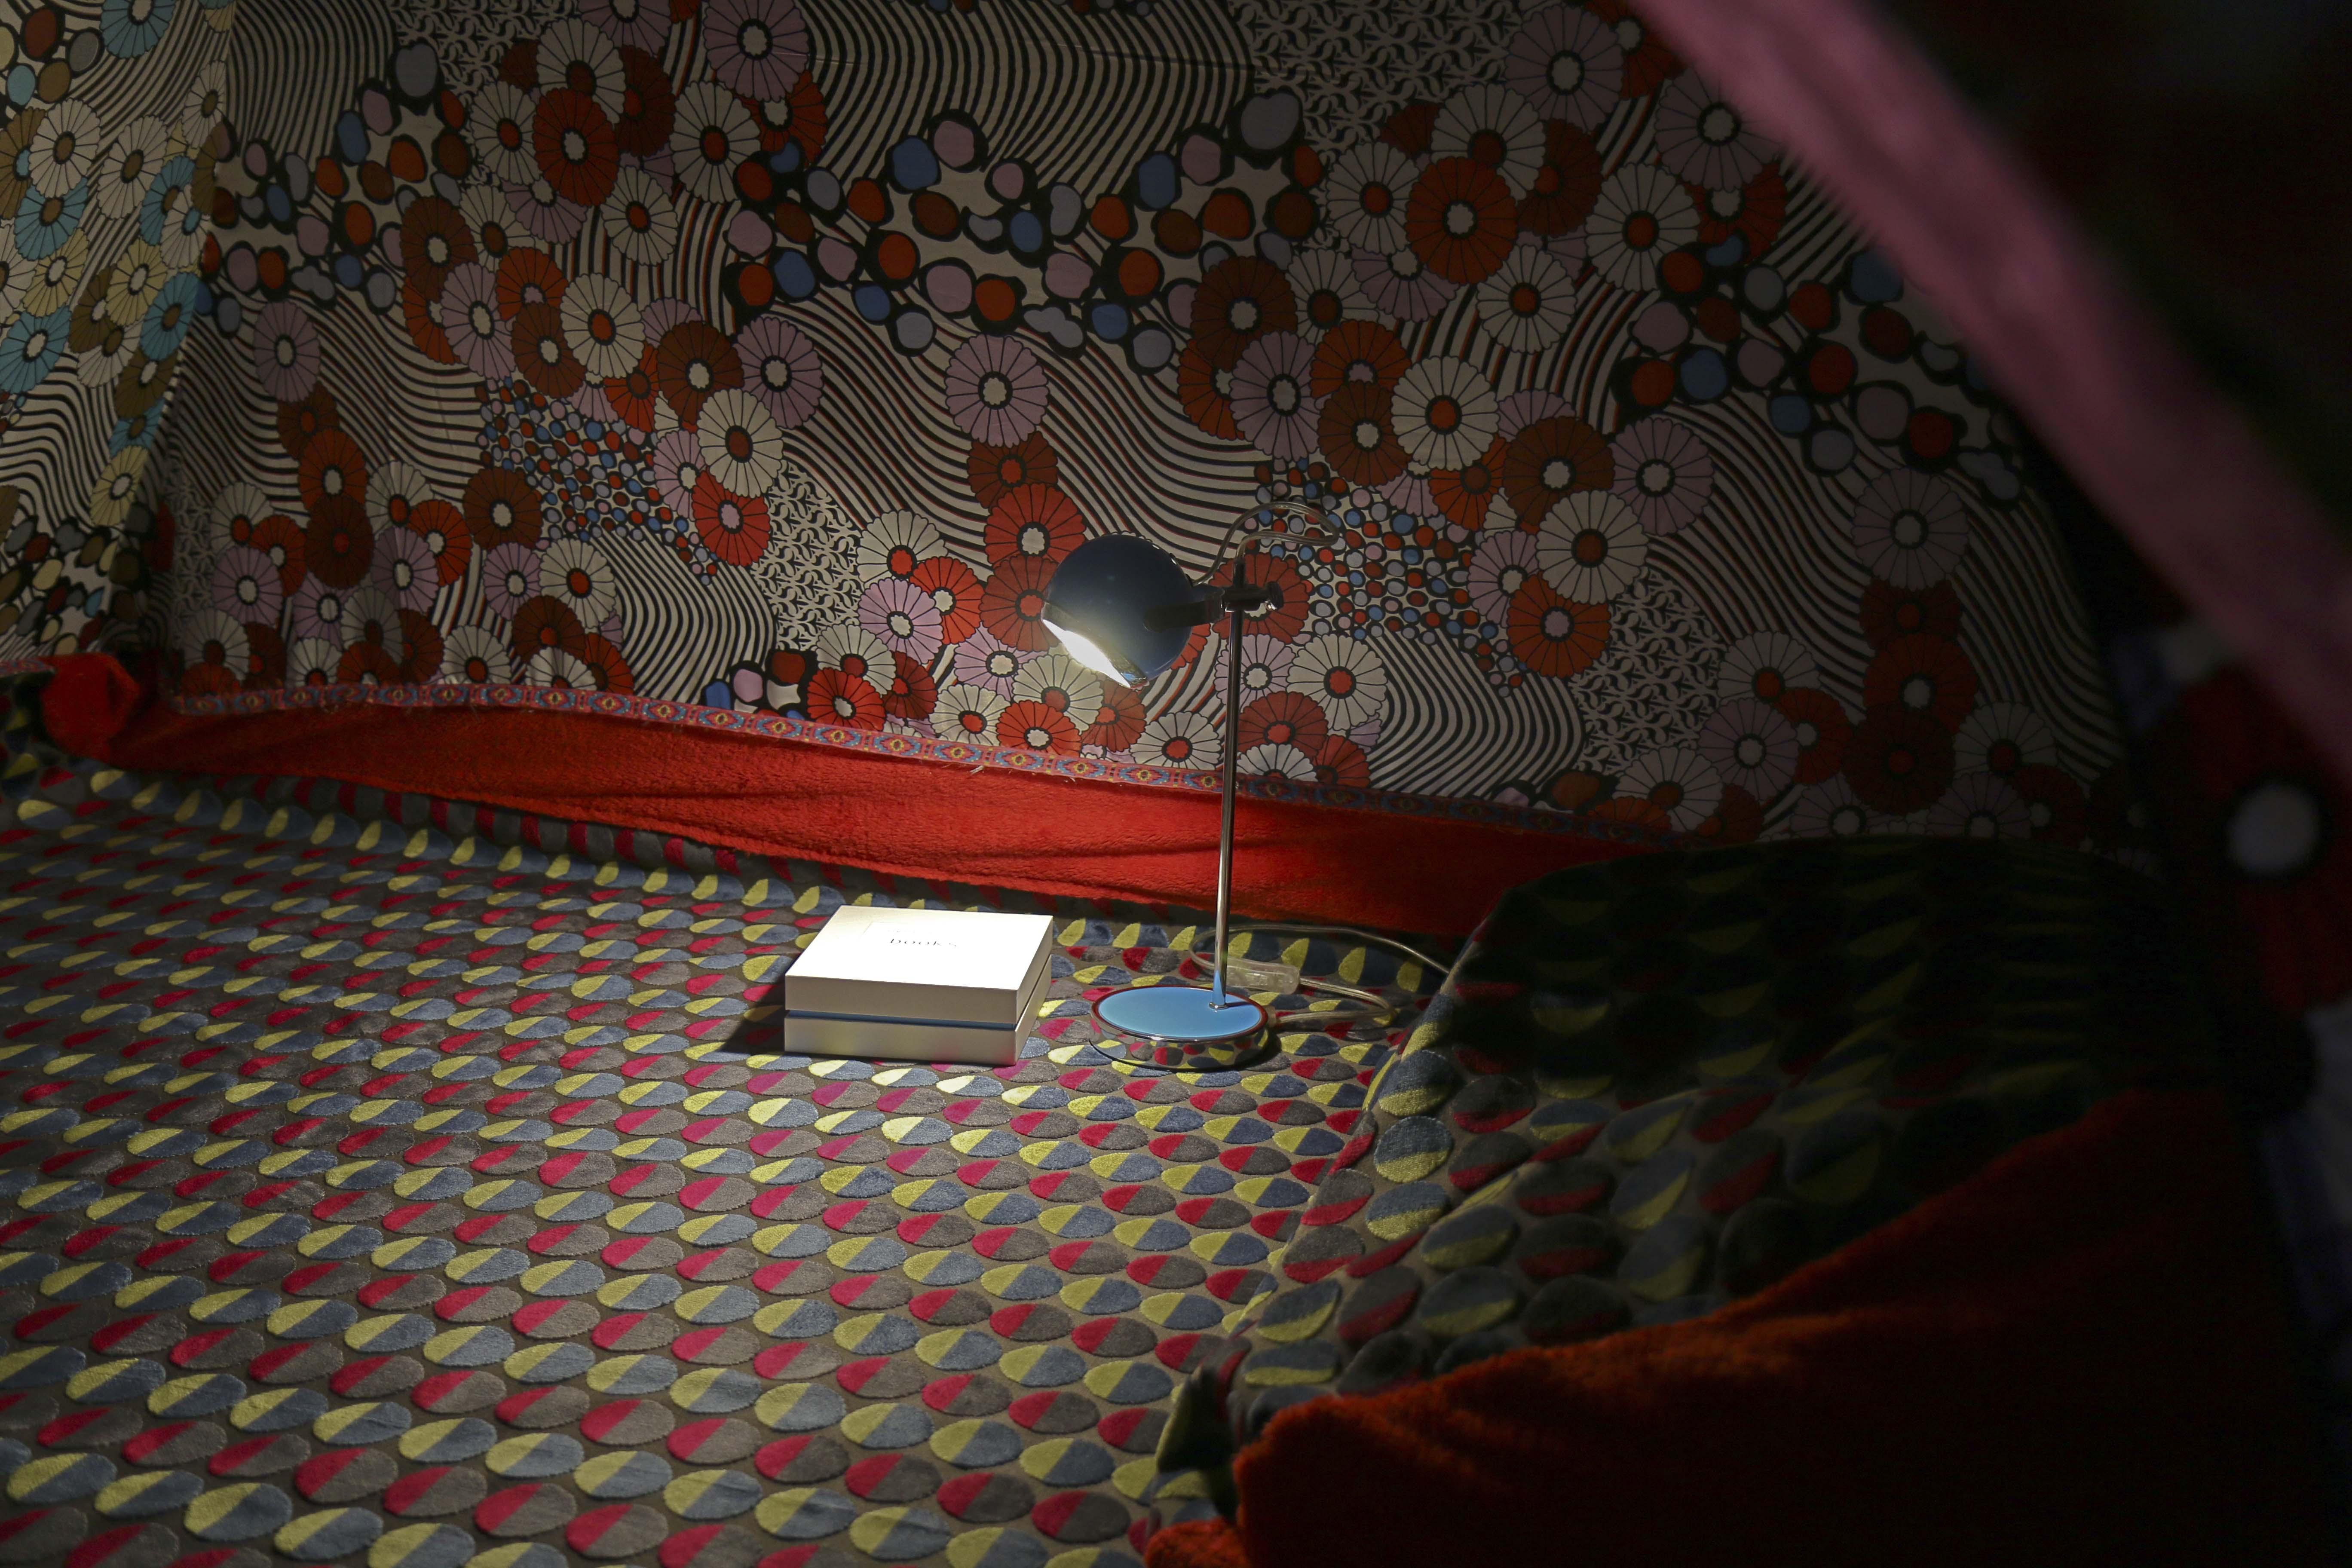 tent interior, book box and lamp